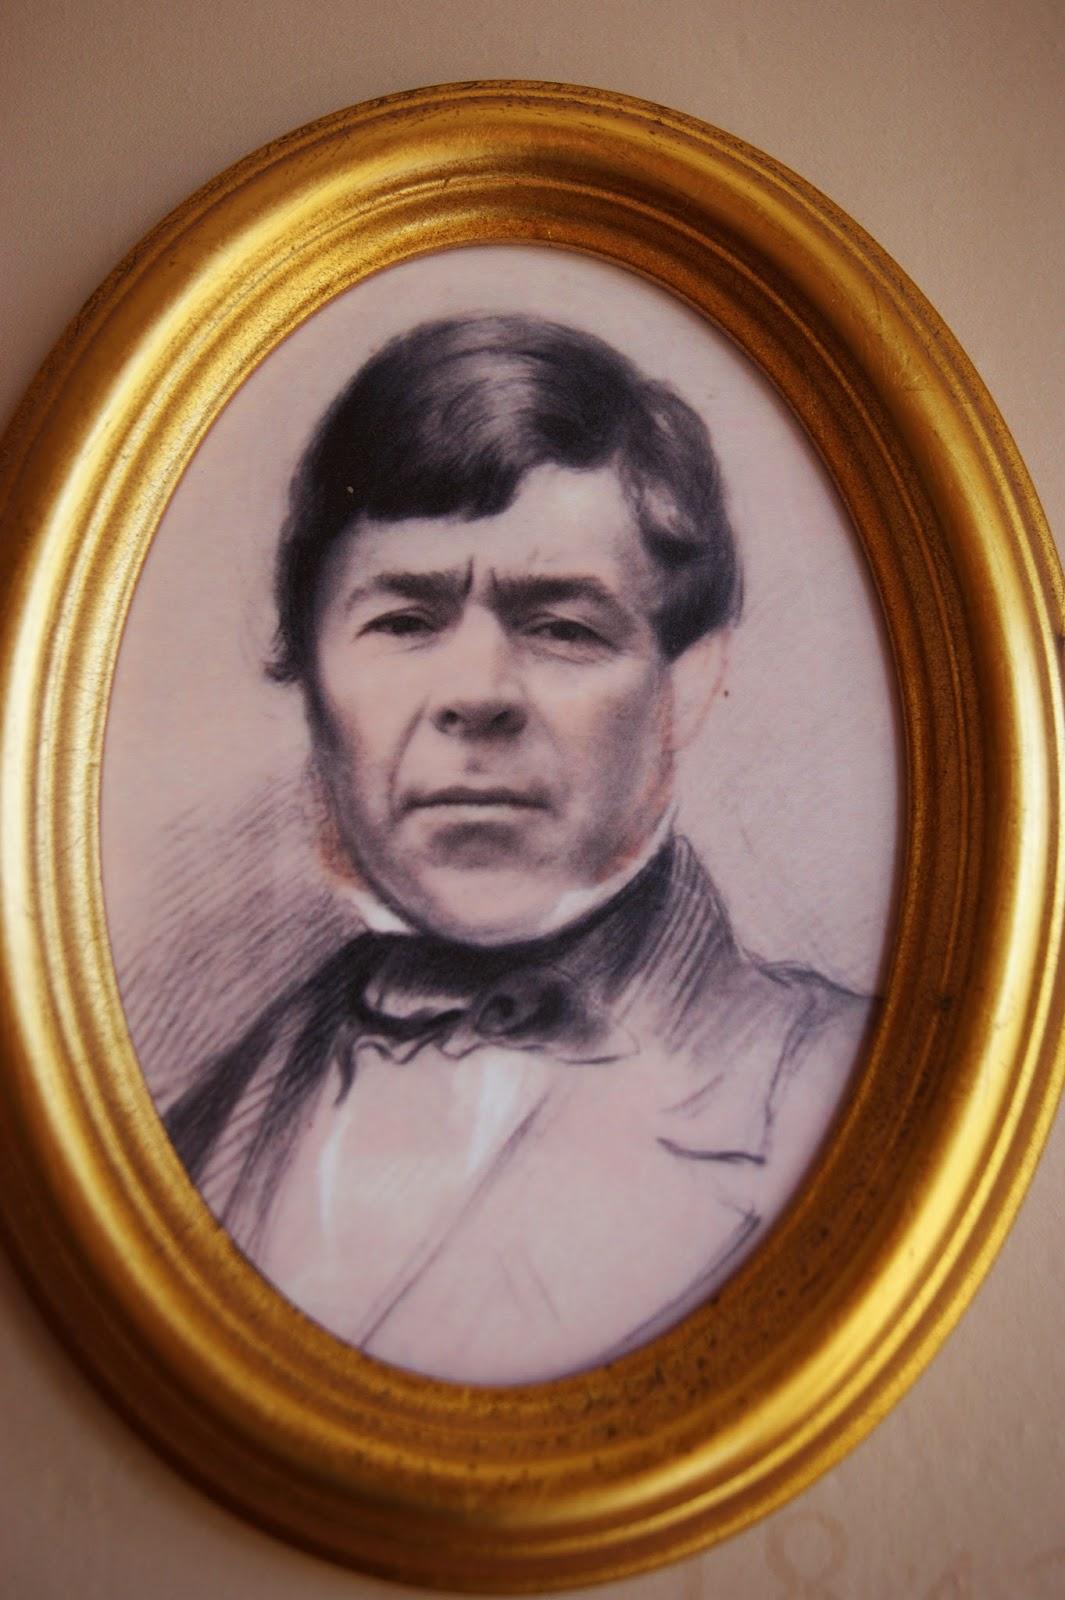 John Lee ARCHER